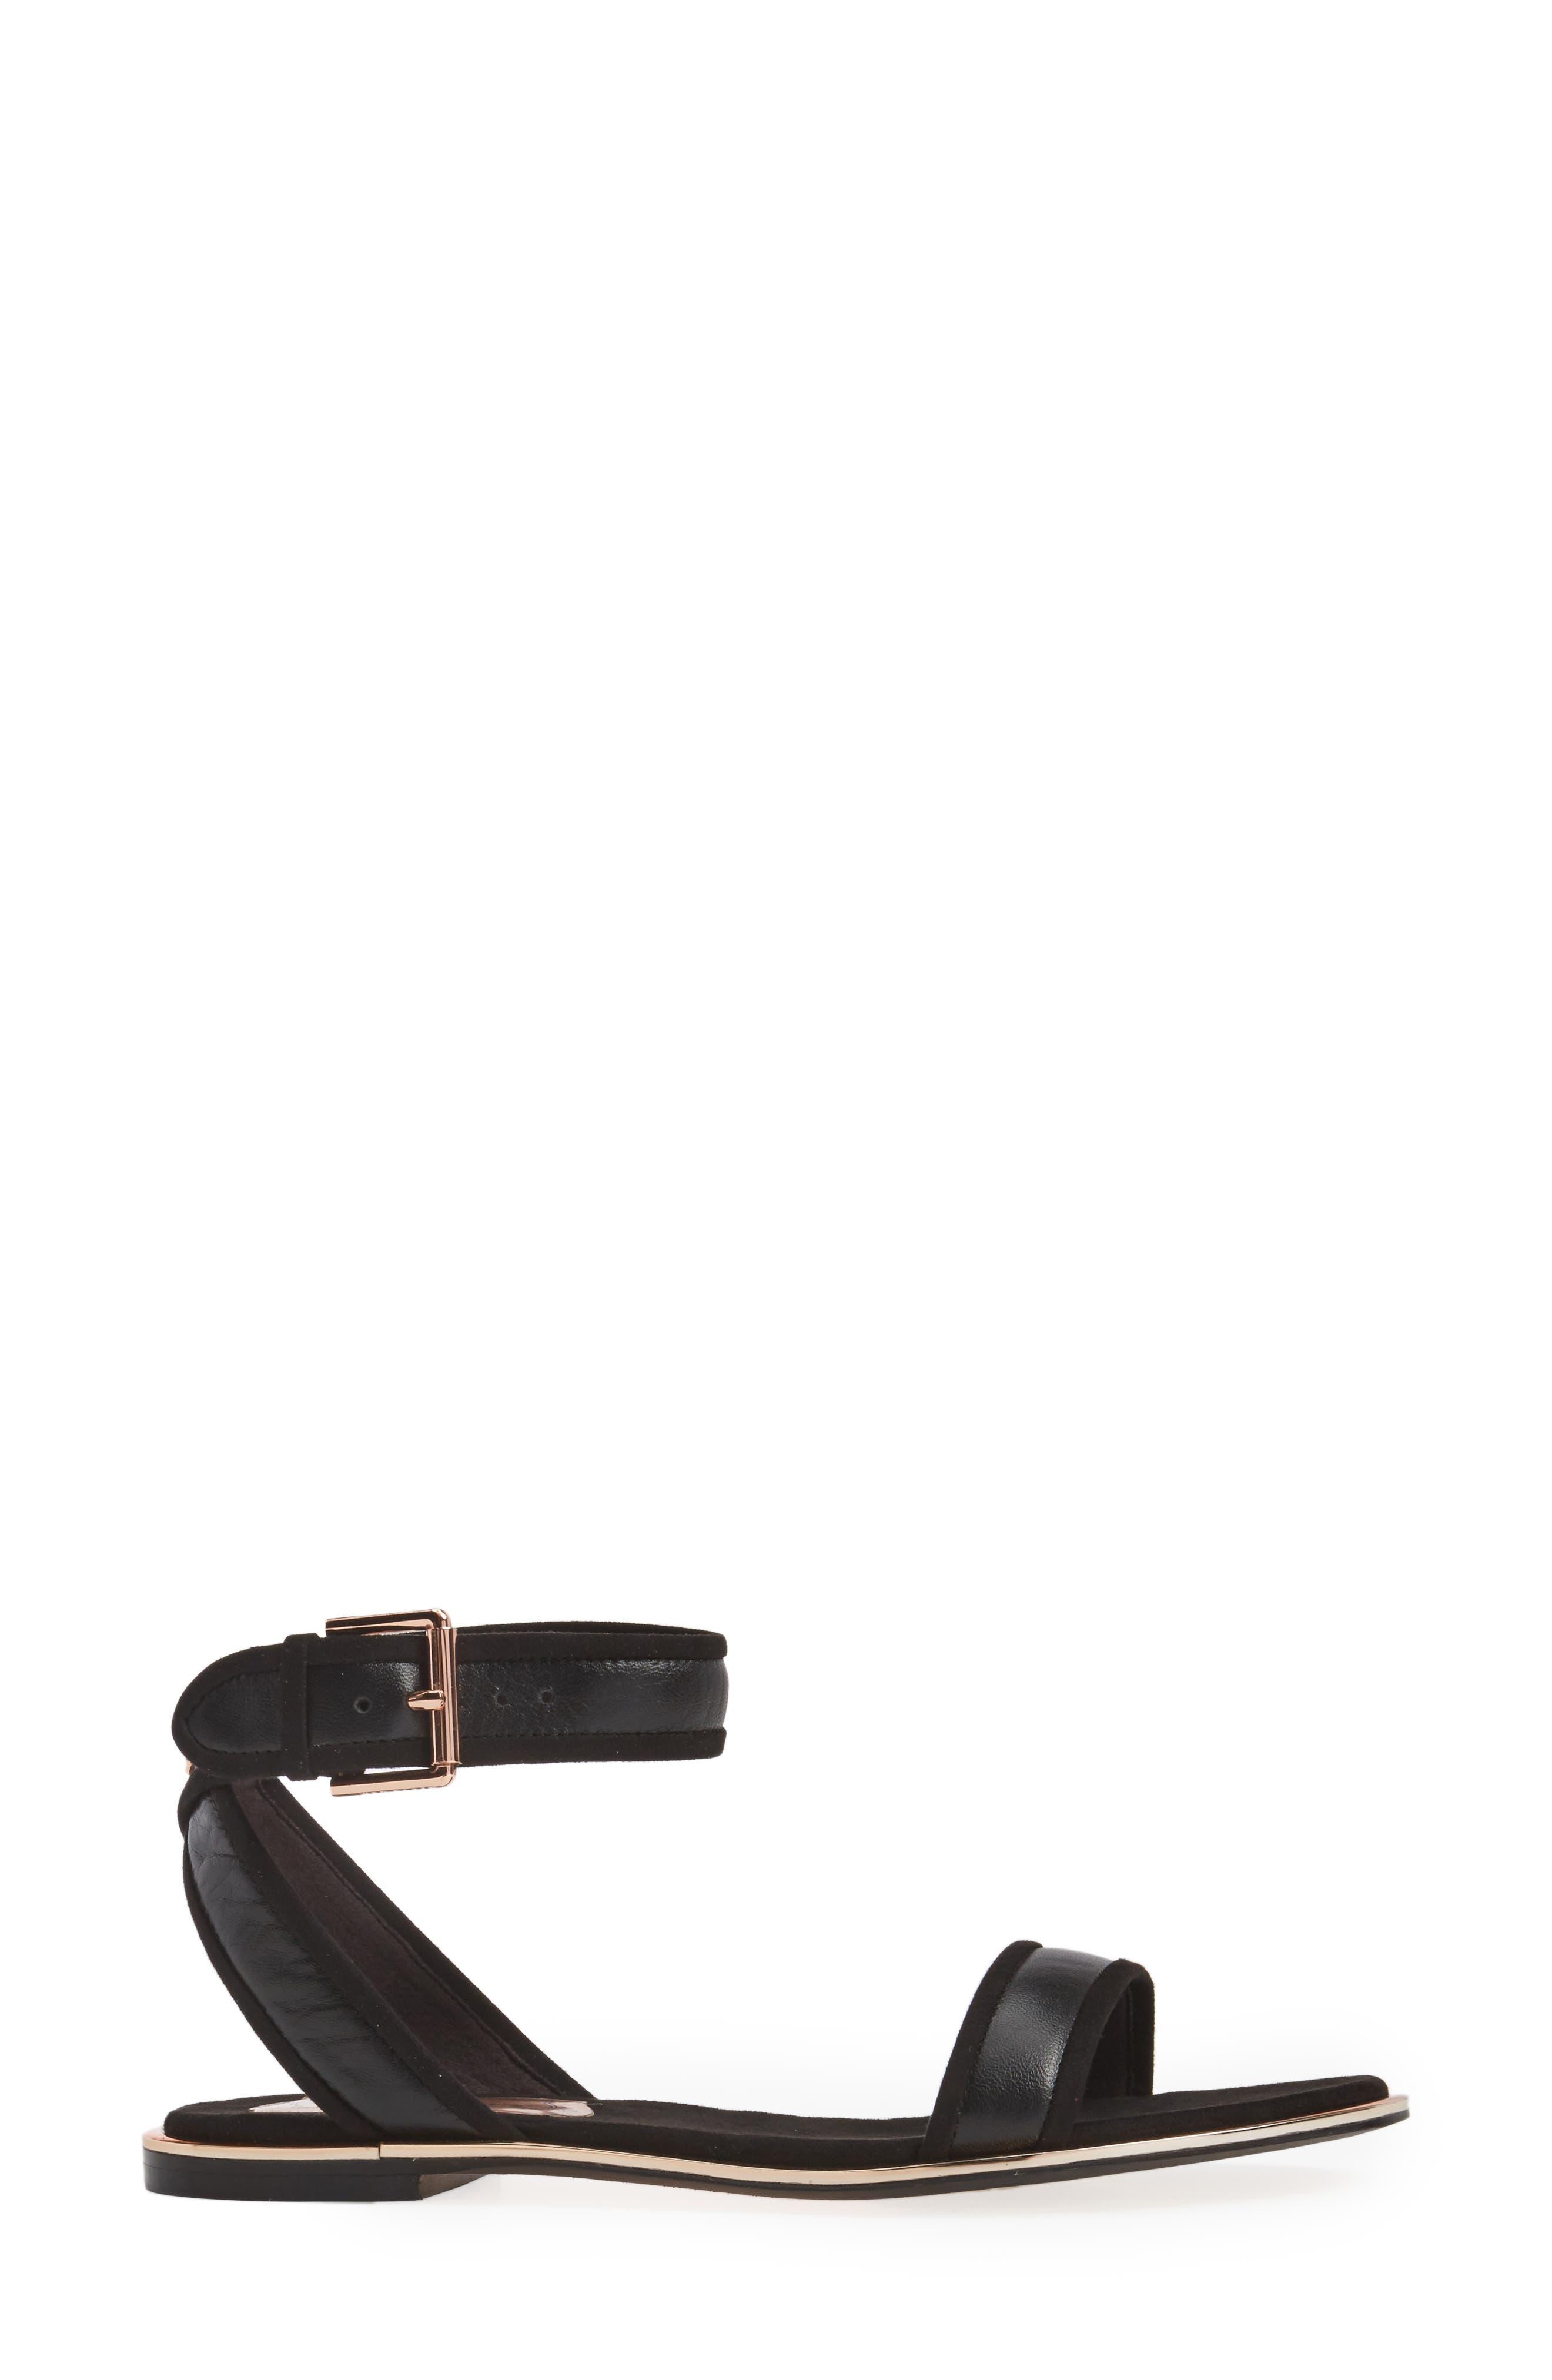 Alternate Image 3  - Ted Baker Alella Ankle Strap Sandal (Women)